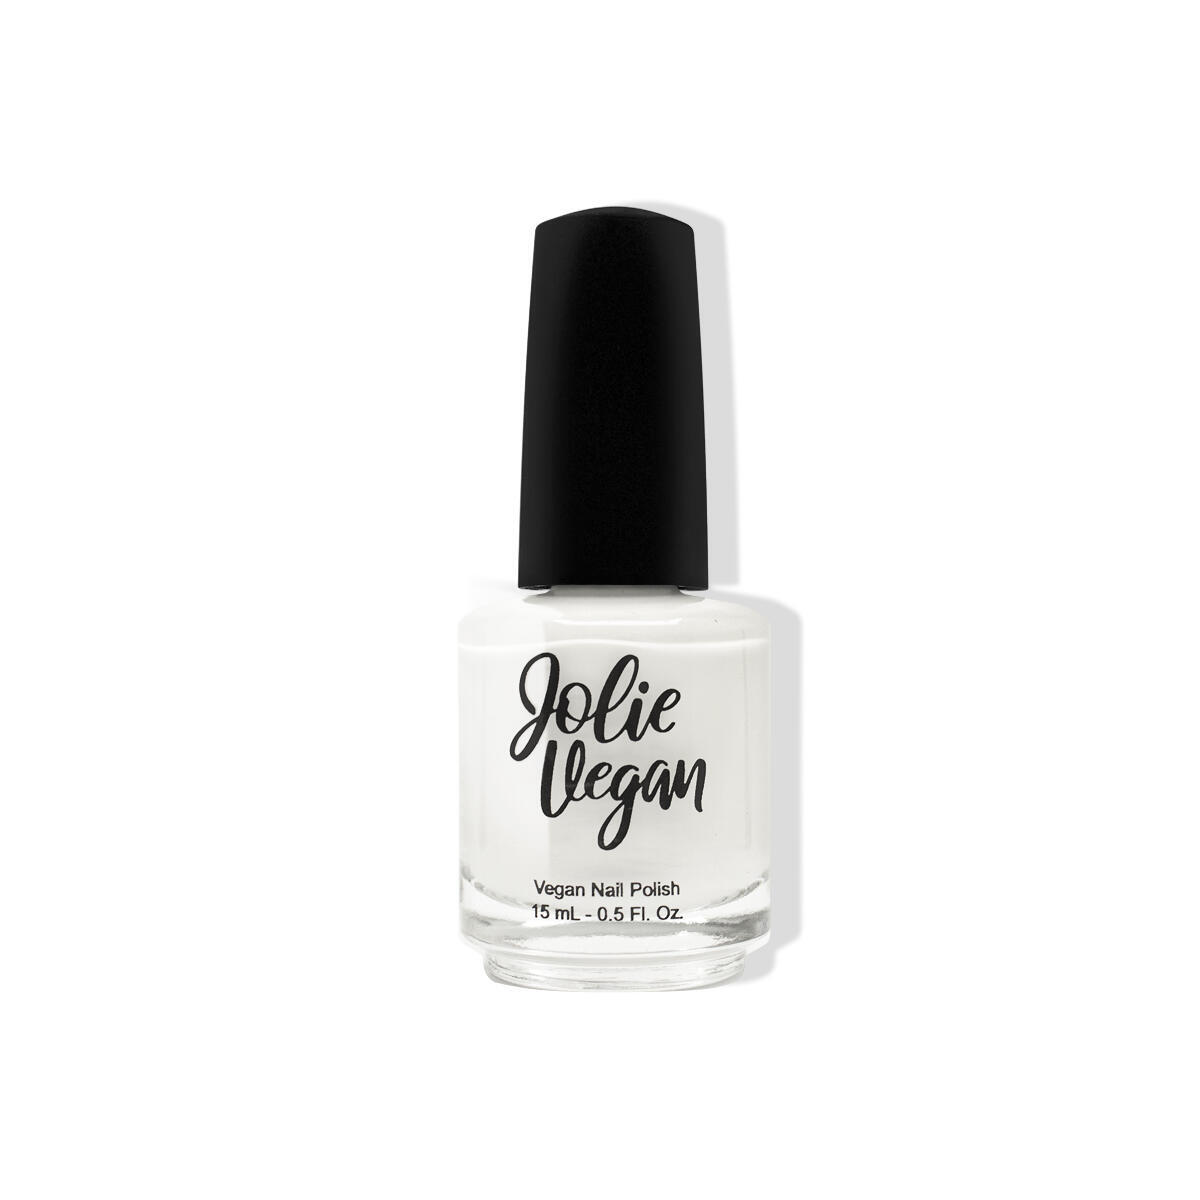 Jolie Vegan Nail Polish - Vegan Nail Polish, Cruelty-Free Nail Polish, Promotes Mental Health, Positive Color Names, Non-Toxic Formula, 11-Free, PETA Certified, 0.5 Fl. Oz. (15 mL) *All colors*